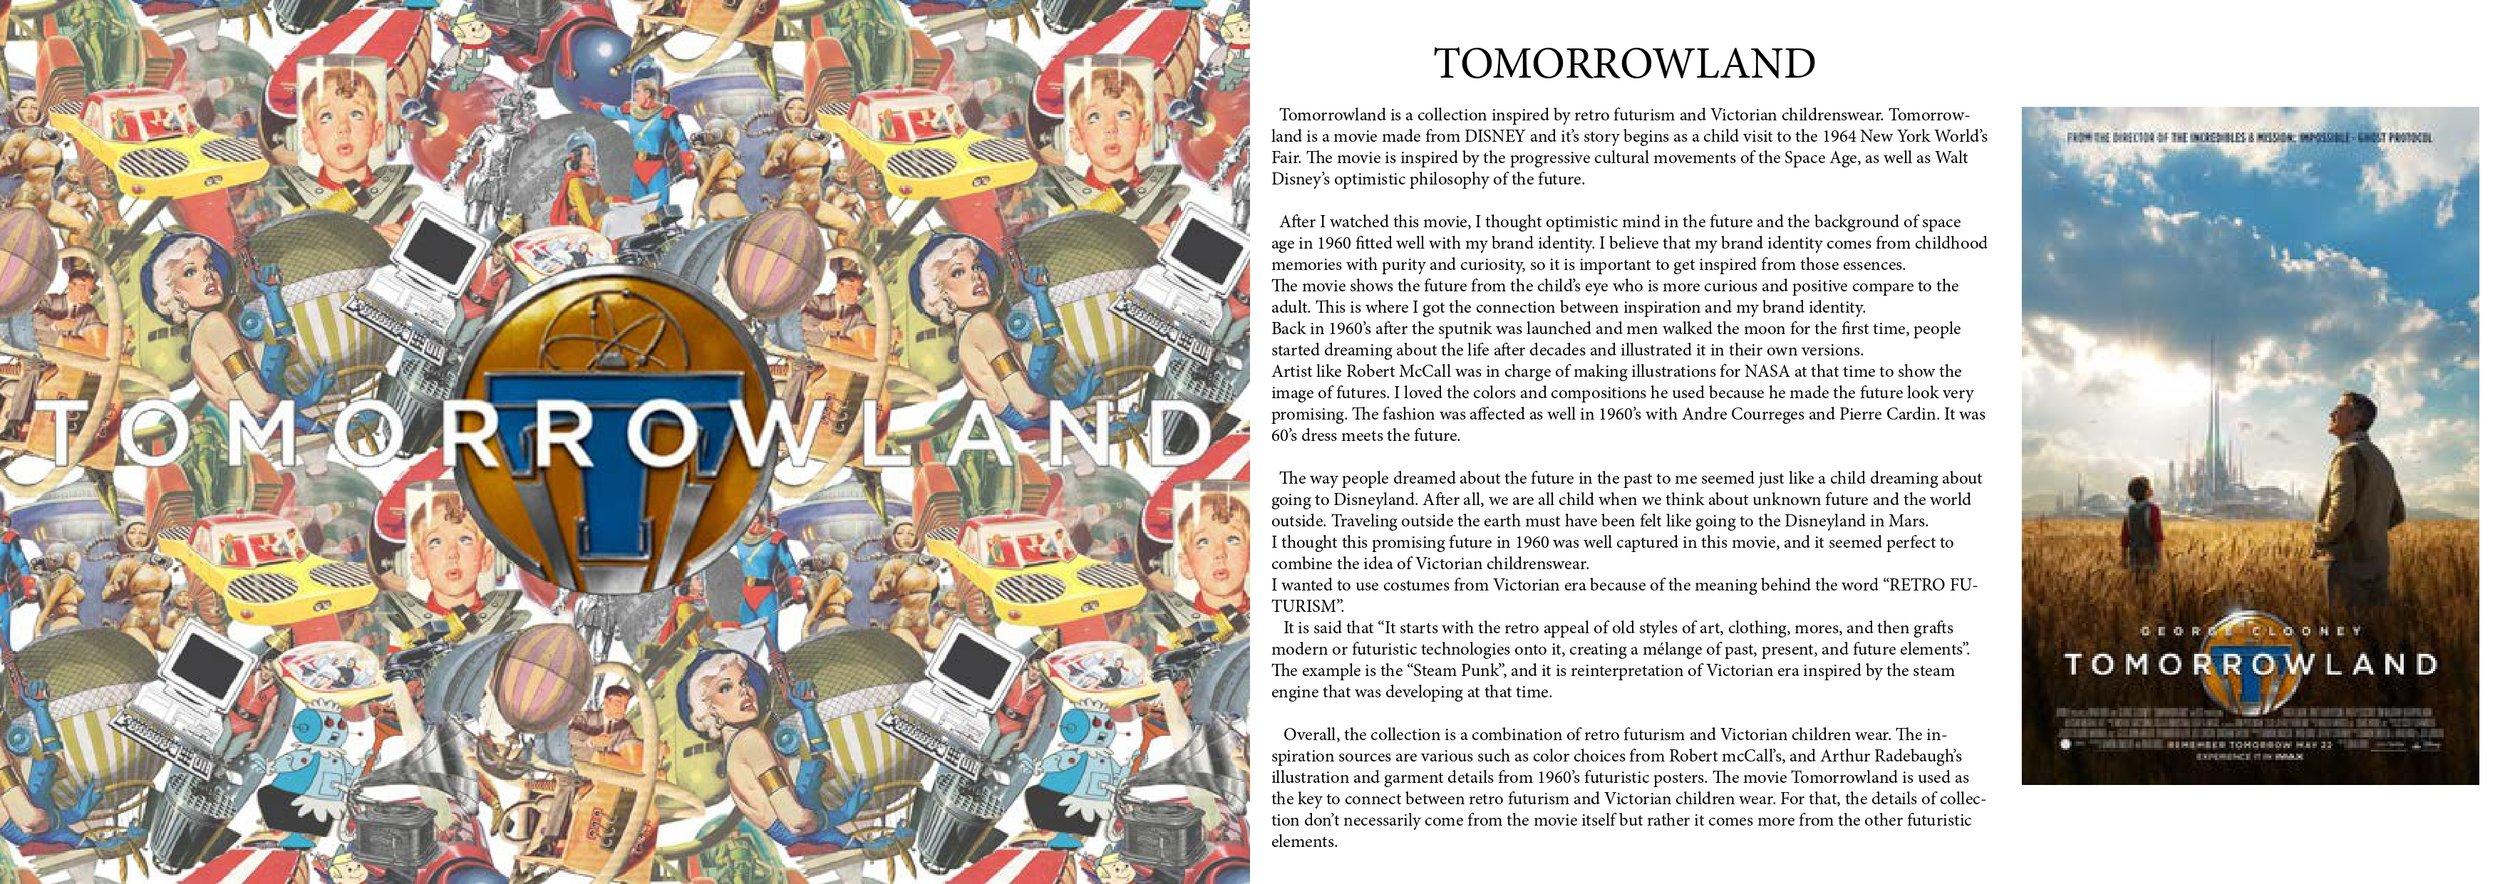 Tomorrowland(portfolio)_page-0001.jpg